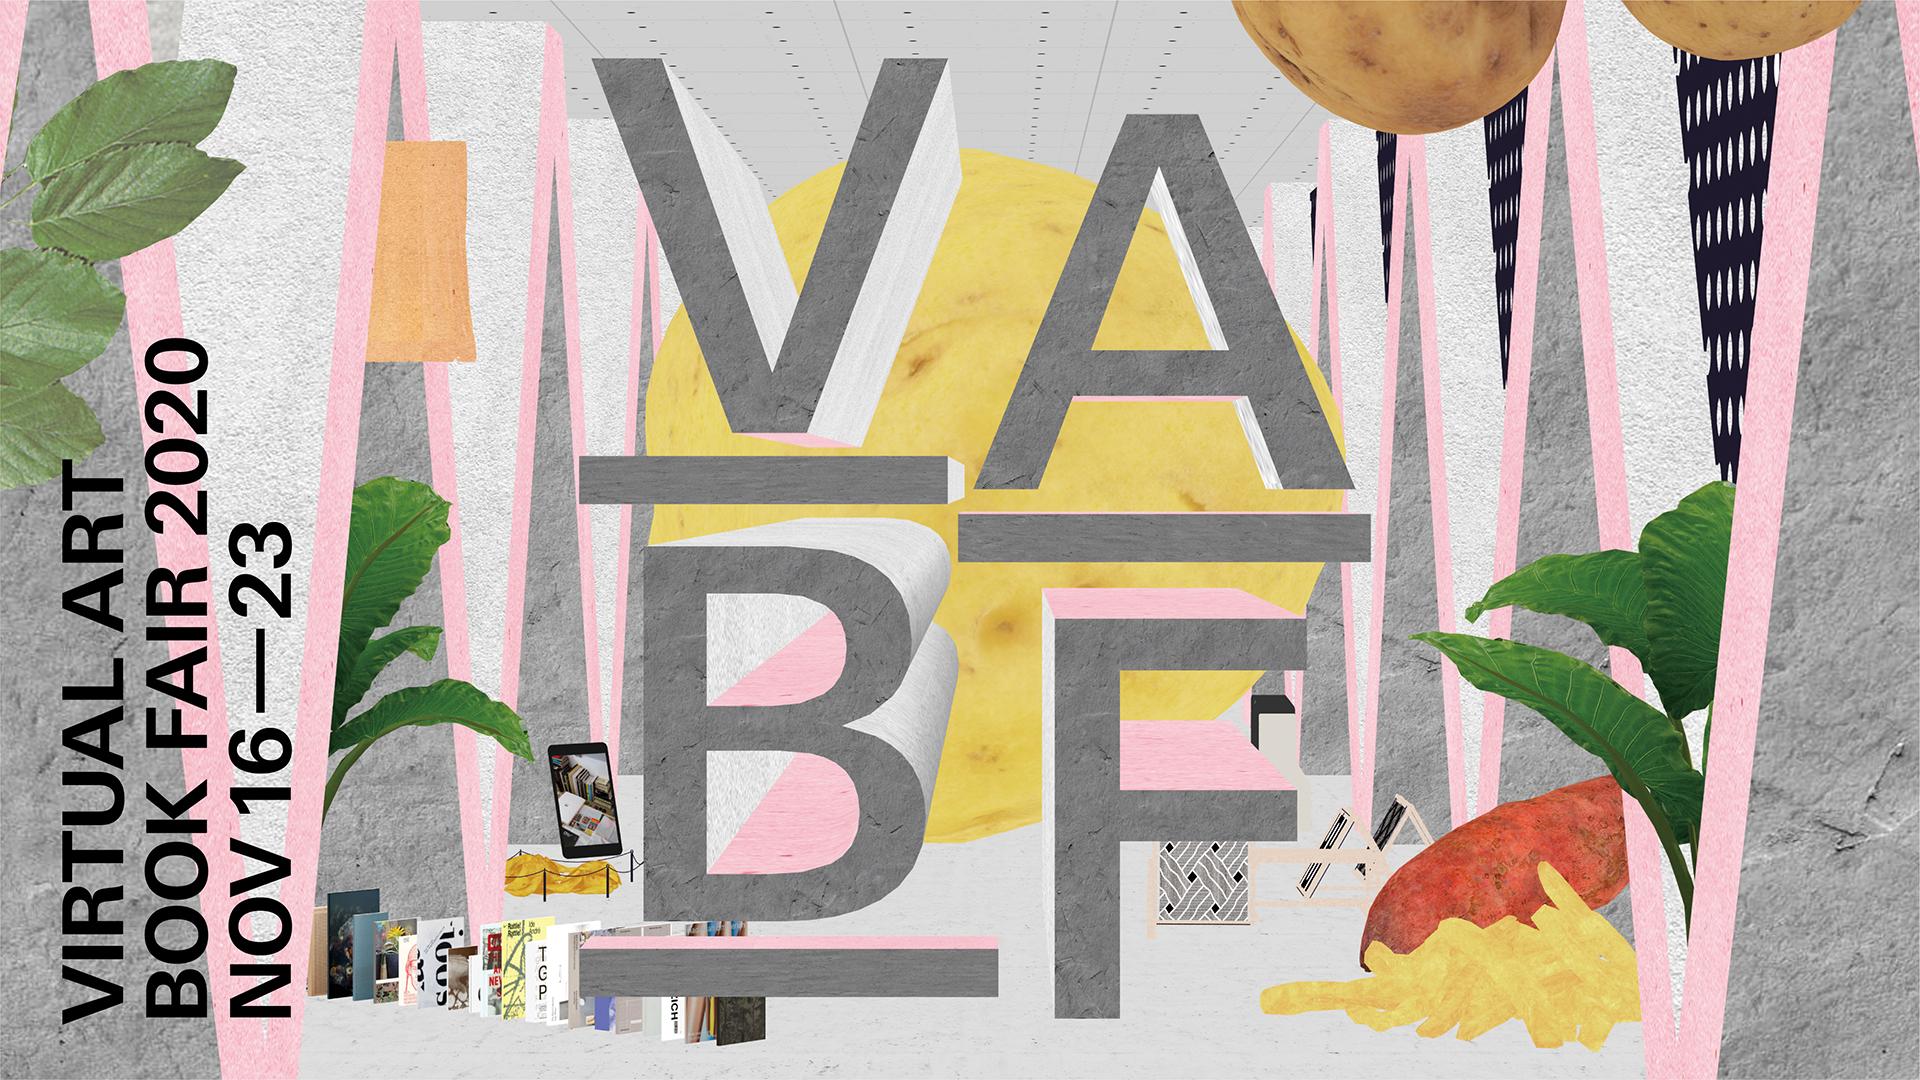 【VIRTUAL ART BOOK FAIR×有楽町「micro FOOD & IDEA MARKET」】日本最大級のアートブックフェアをmicroで開催!